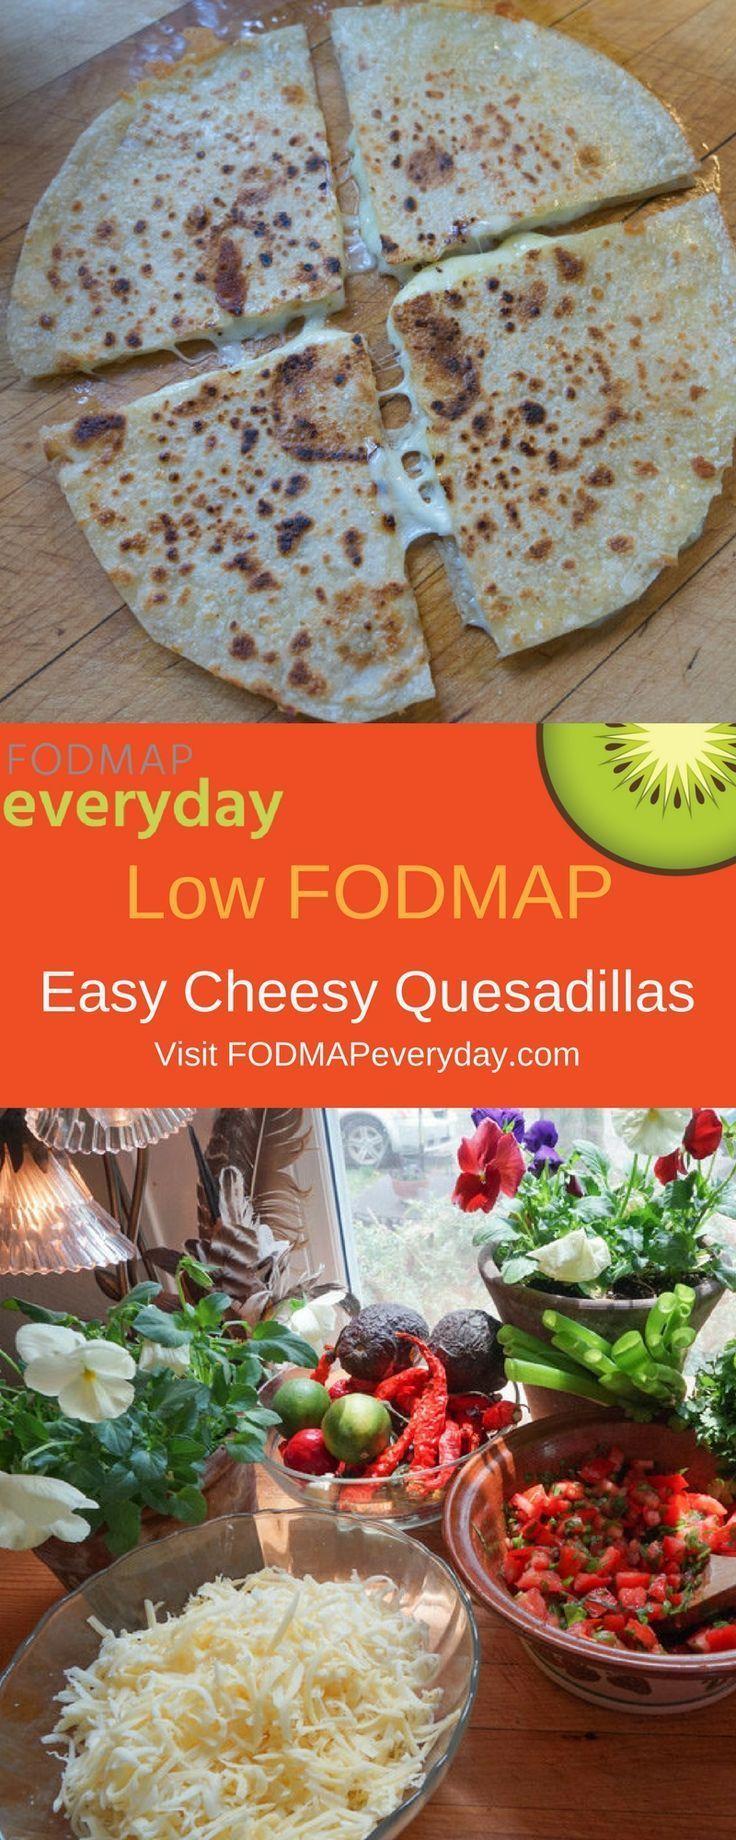 can i eat quesadillas on lo fodmap diet